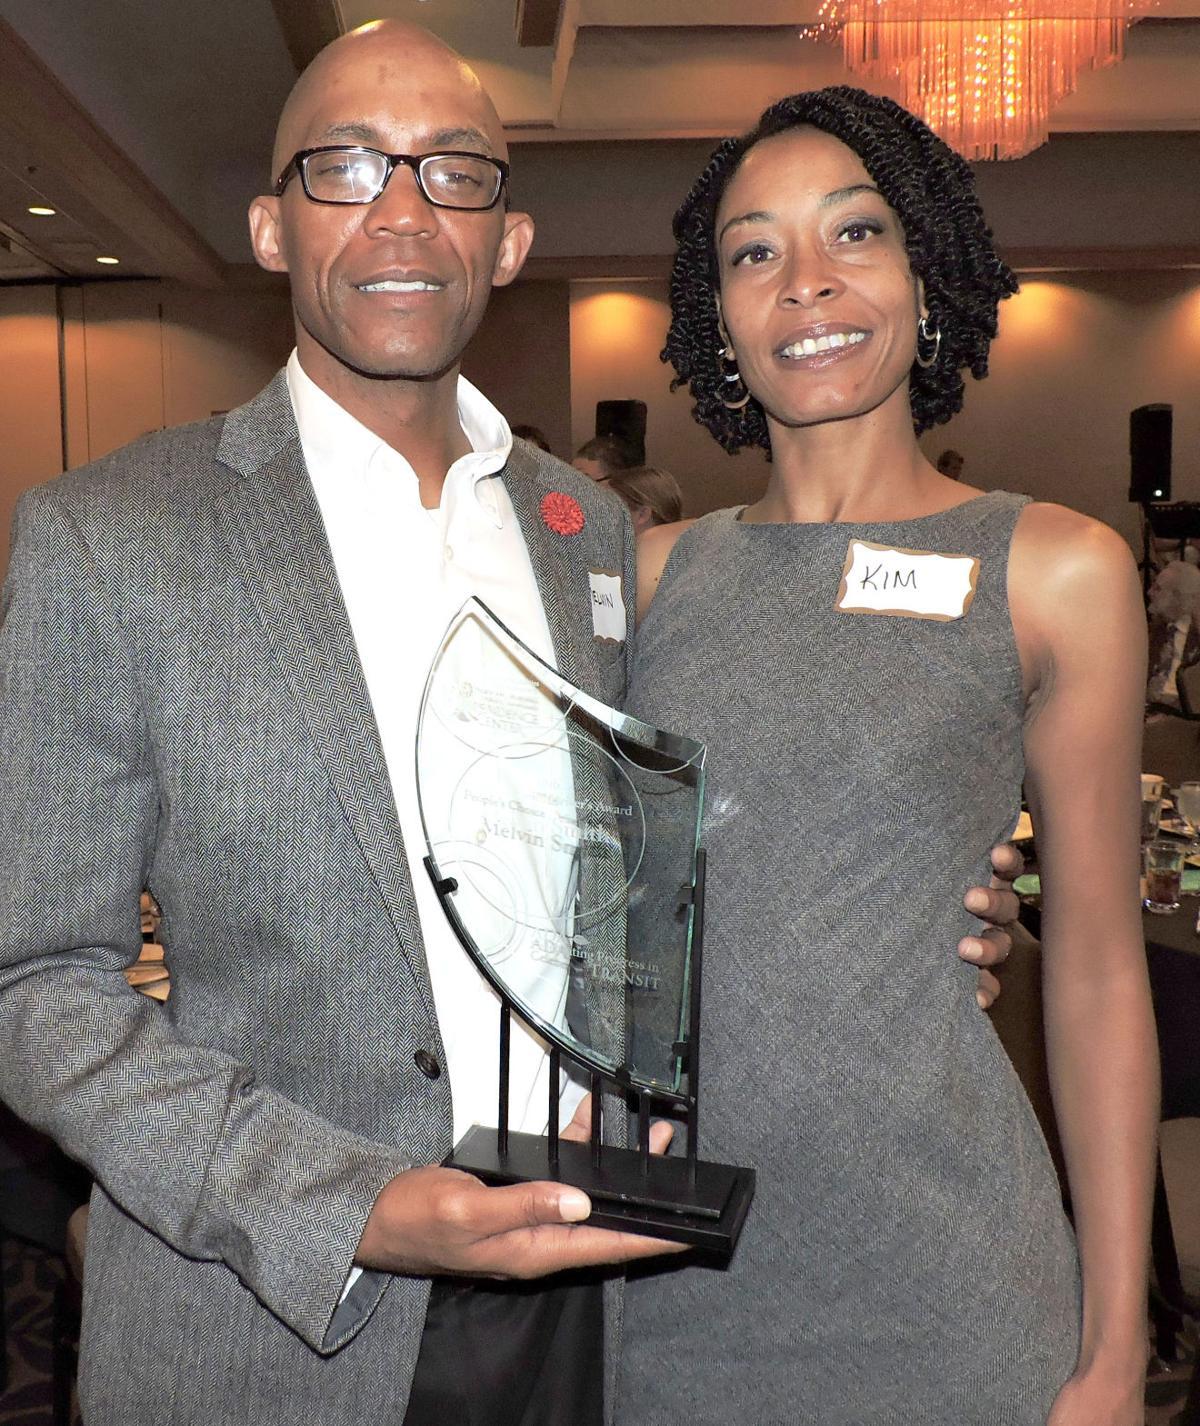 People's Choice Driver's Award recipient Melvin Smith, Amblicab, and wife Kim. 072616 Photo by Linda Navarro